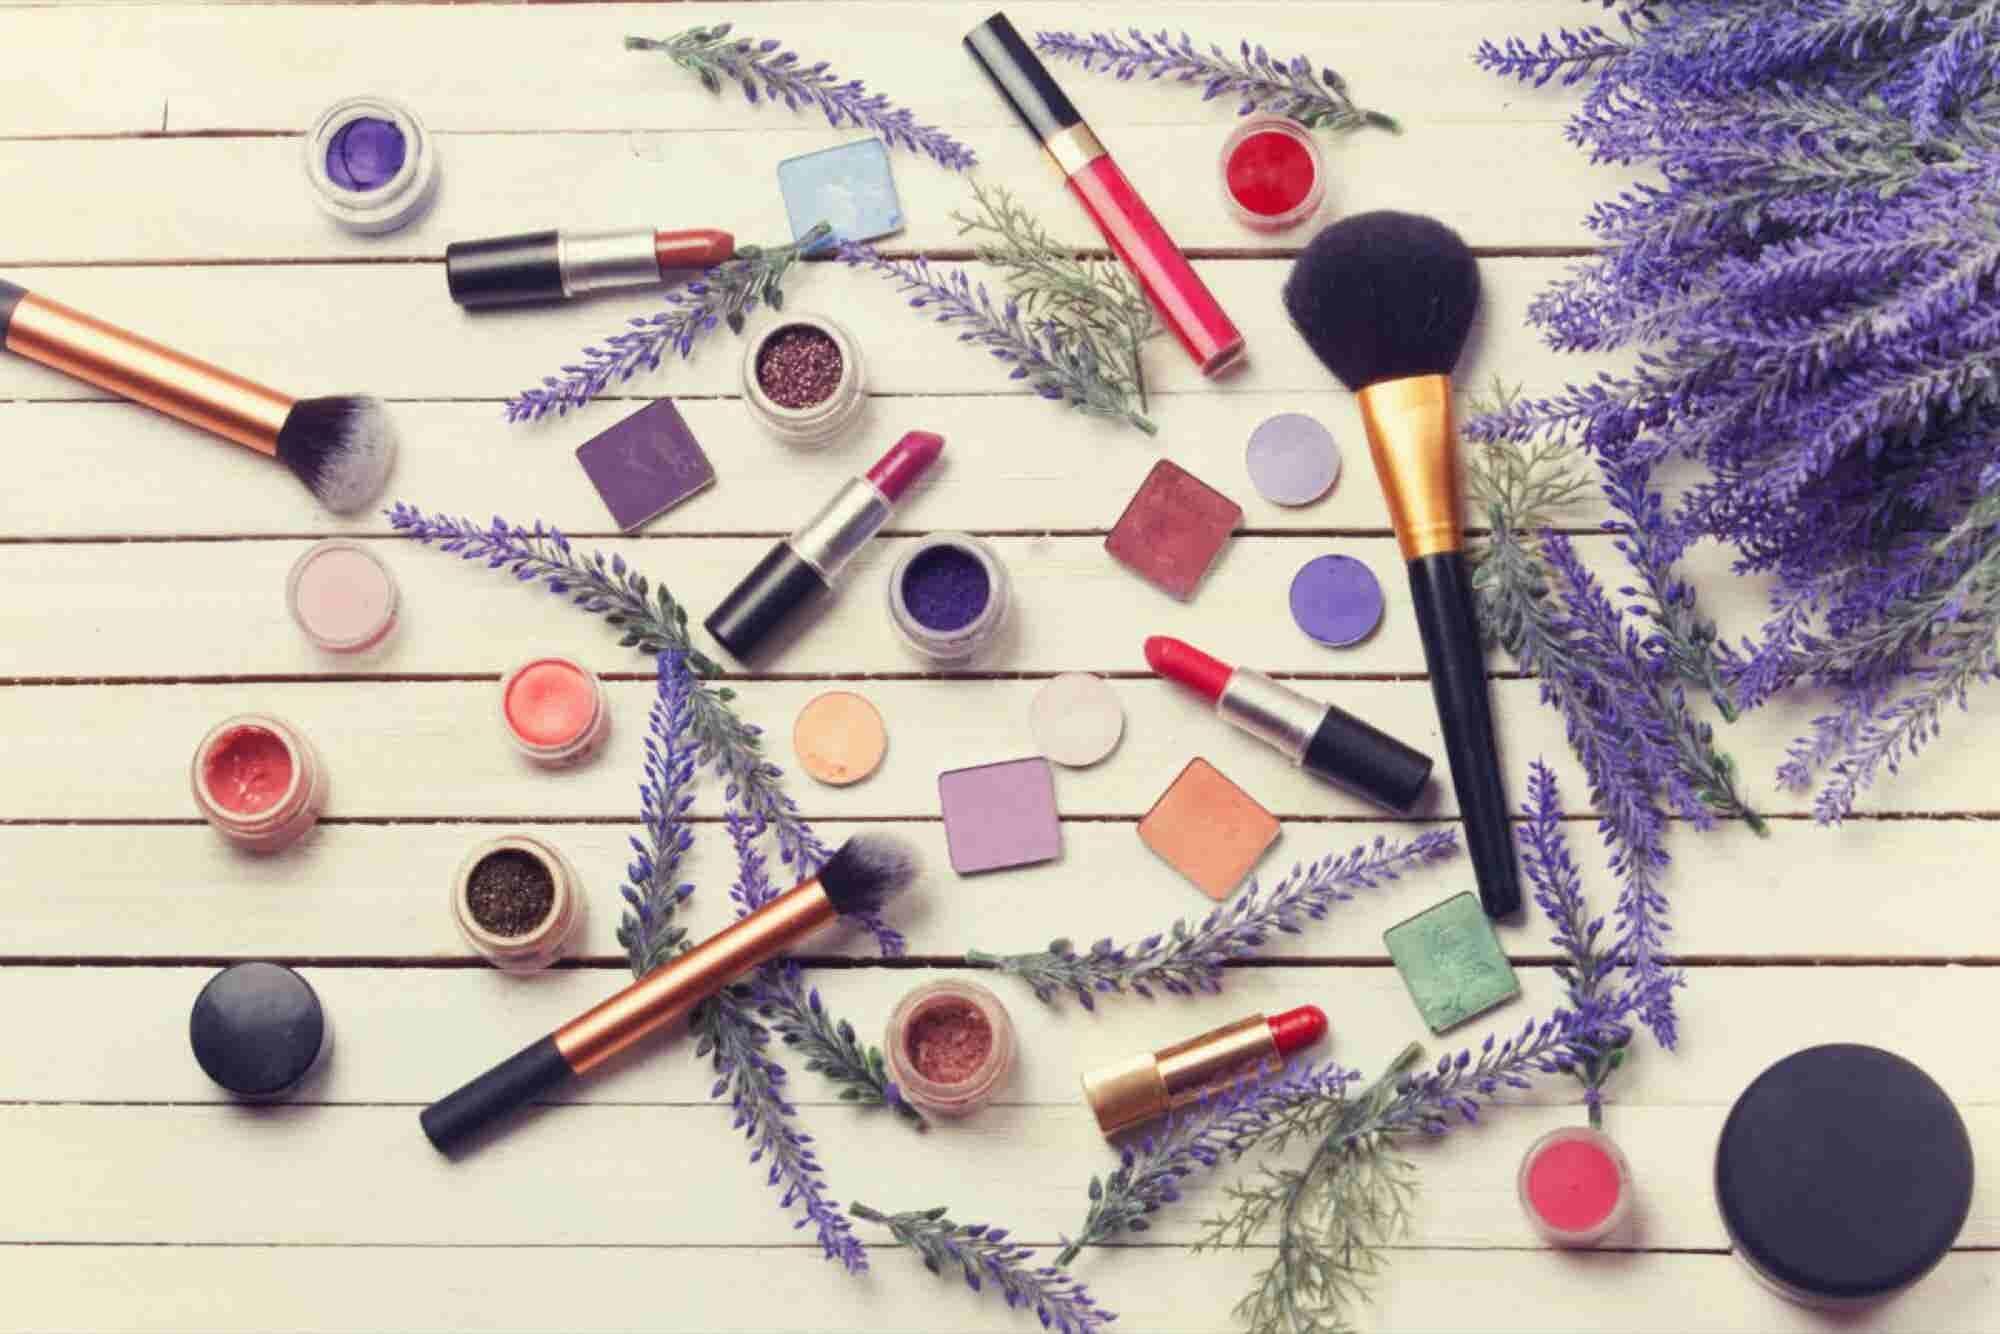 Abre un servicio premium de belleza a domicilio